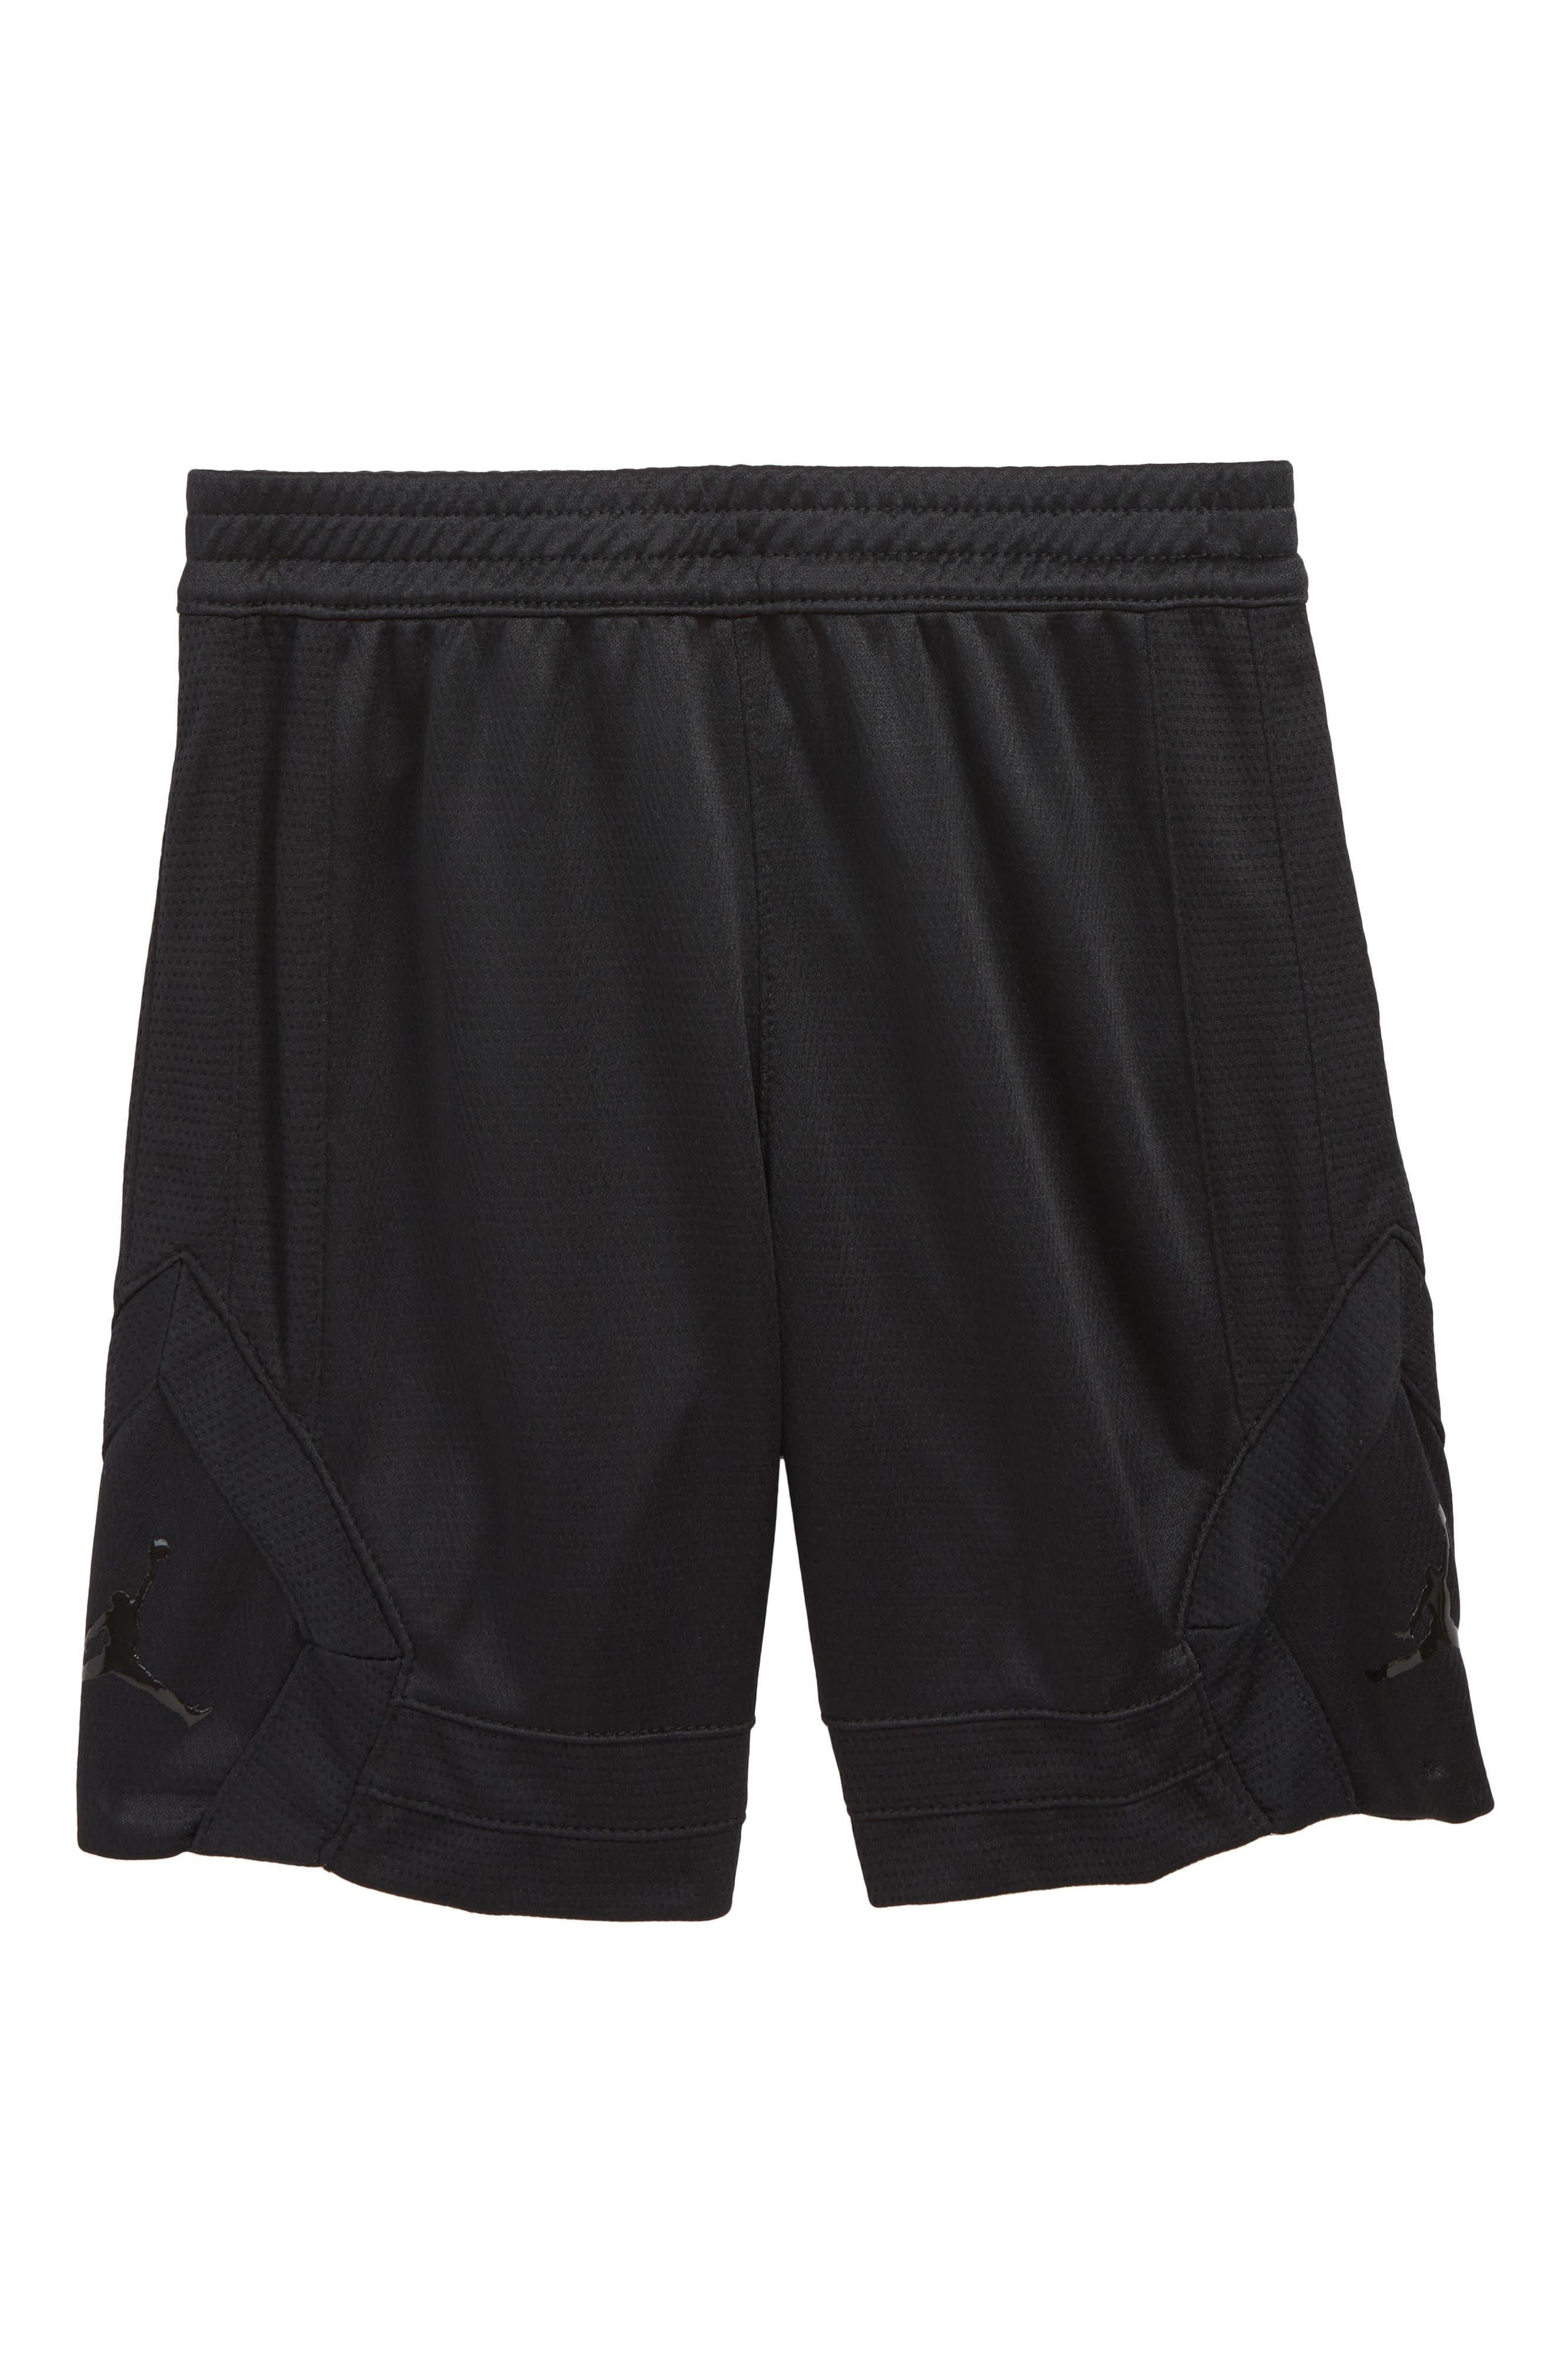 Jordan Rise Basketball Shorts,                         Main,                         color, BLACK